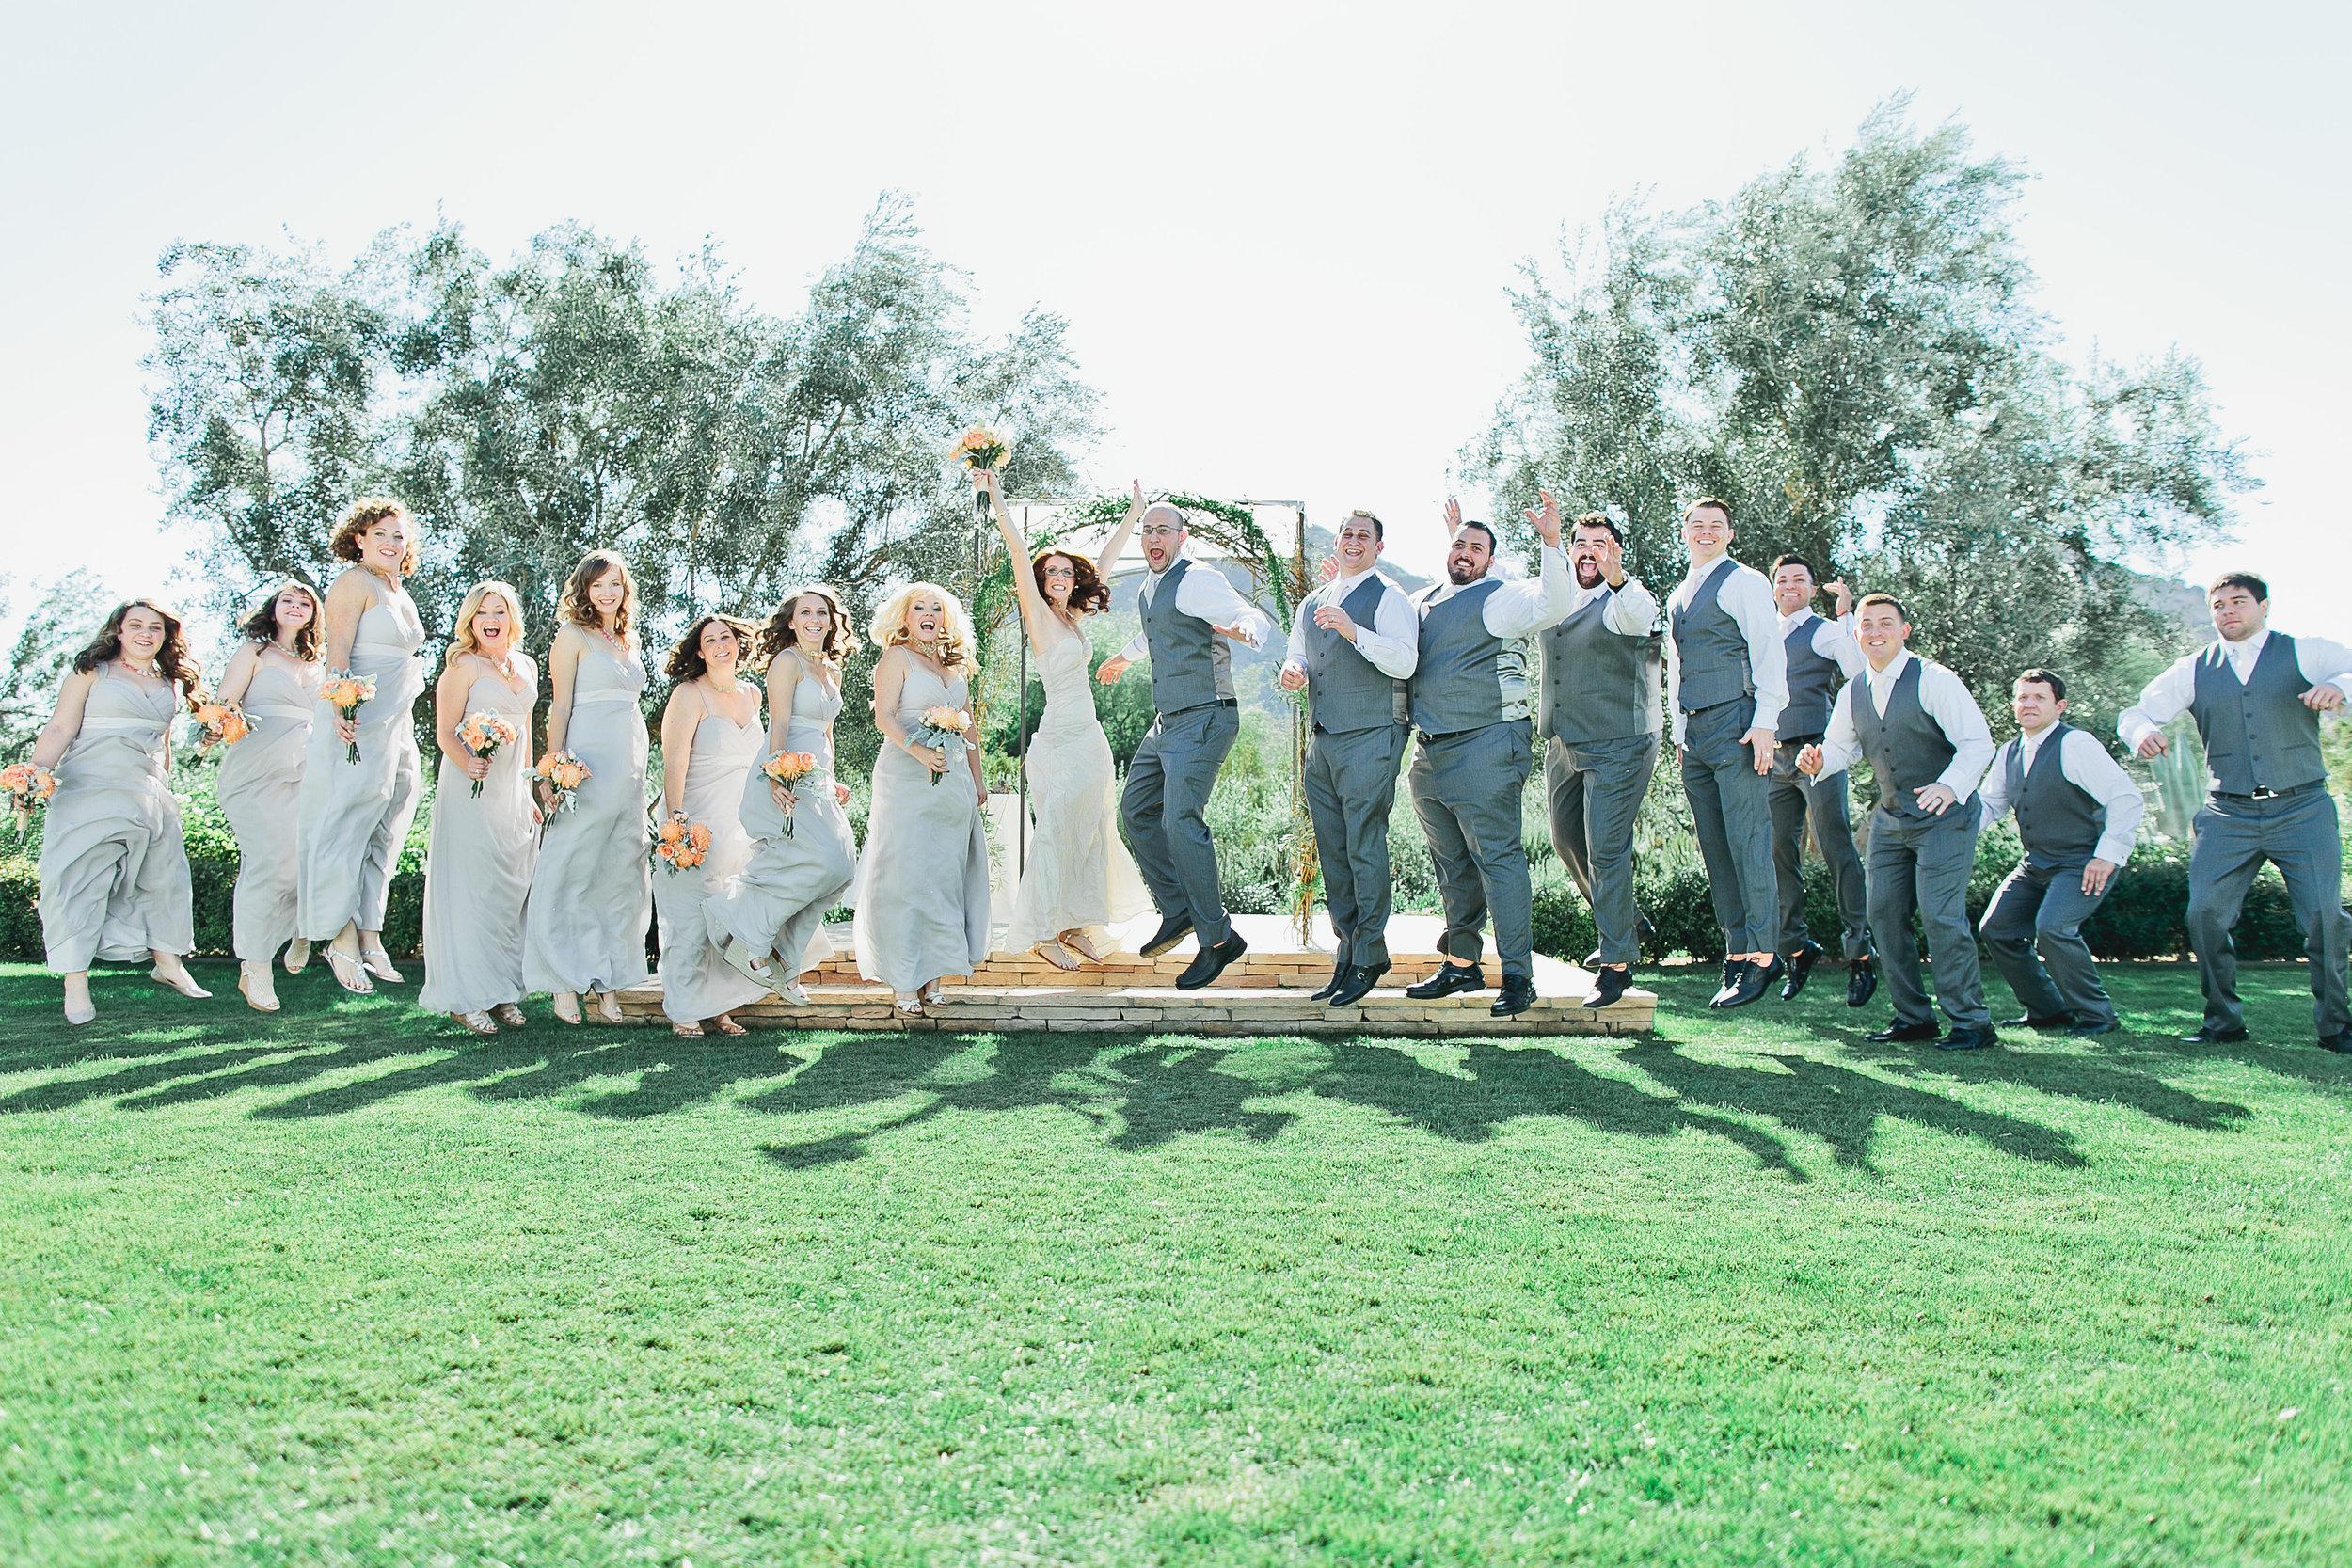 Simple Brunch Wedding at El Chorro in Paradise Valley, Arizona- Konsider It Done- AZ Arizona Wedding & Event Planner, Designer, Coordinator Planning in Scottsdale, Phoenix, Paradise Valley, Tempe, Gilbert, Mesa, Chandler, Tucson, Sedona